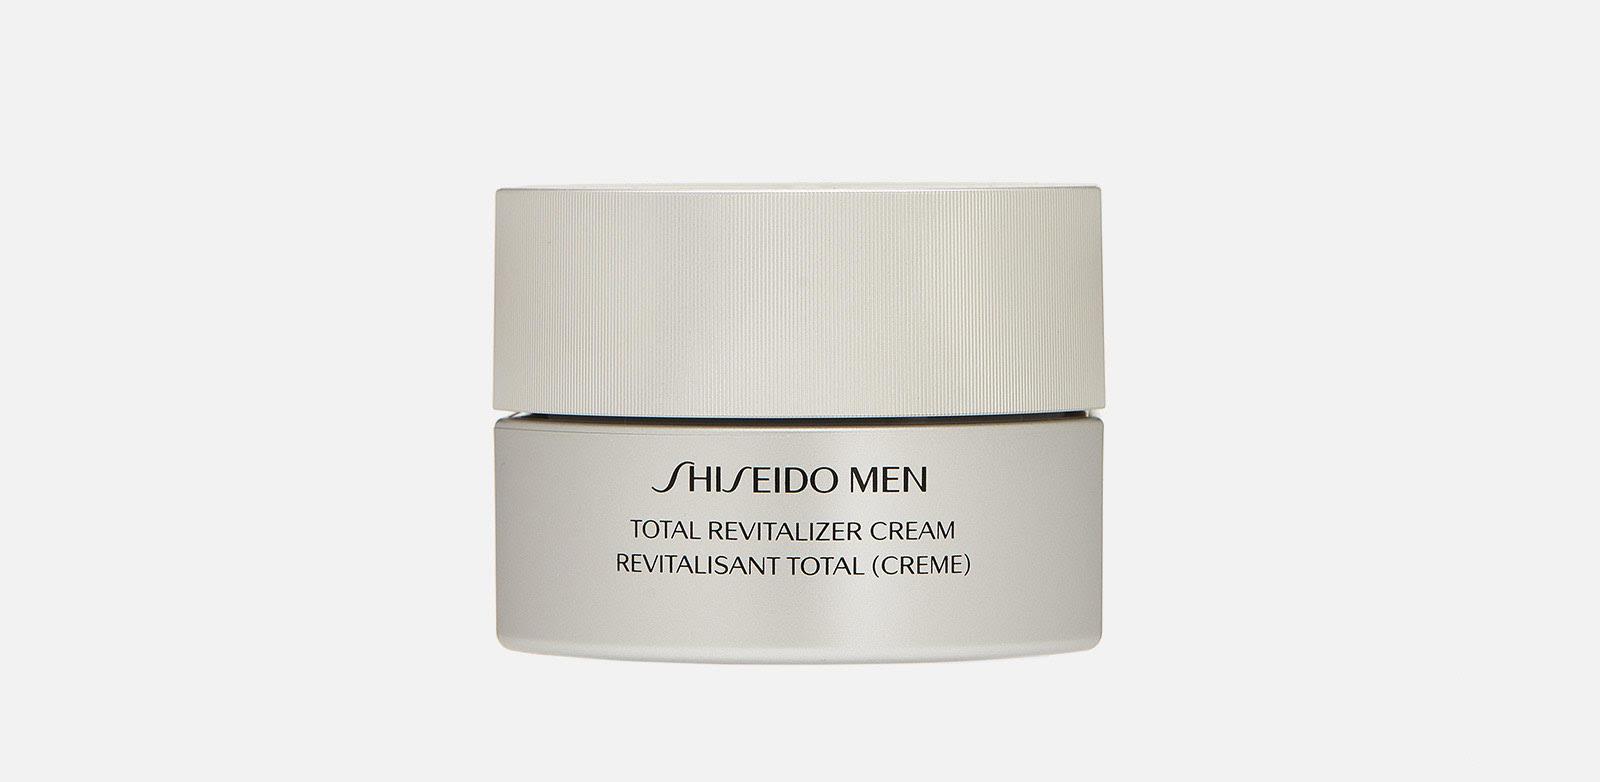 Крем Total Revitalizer Cream Shiseido men